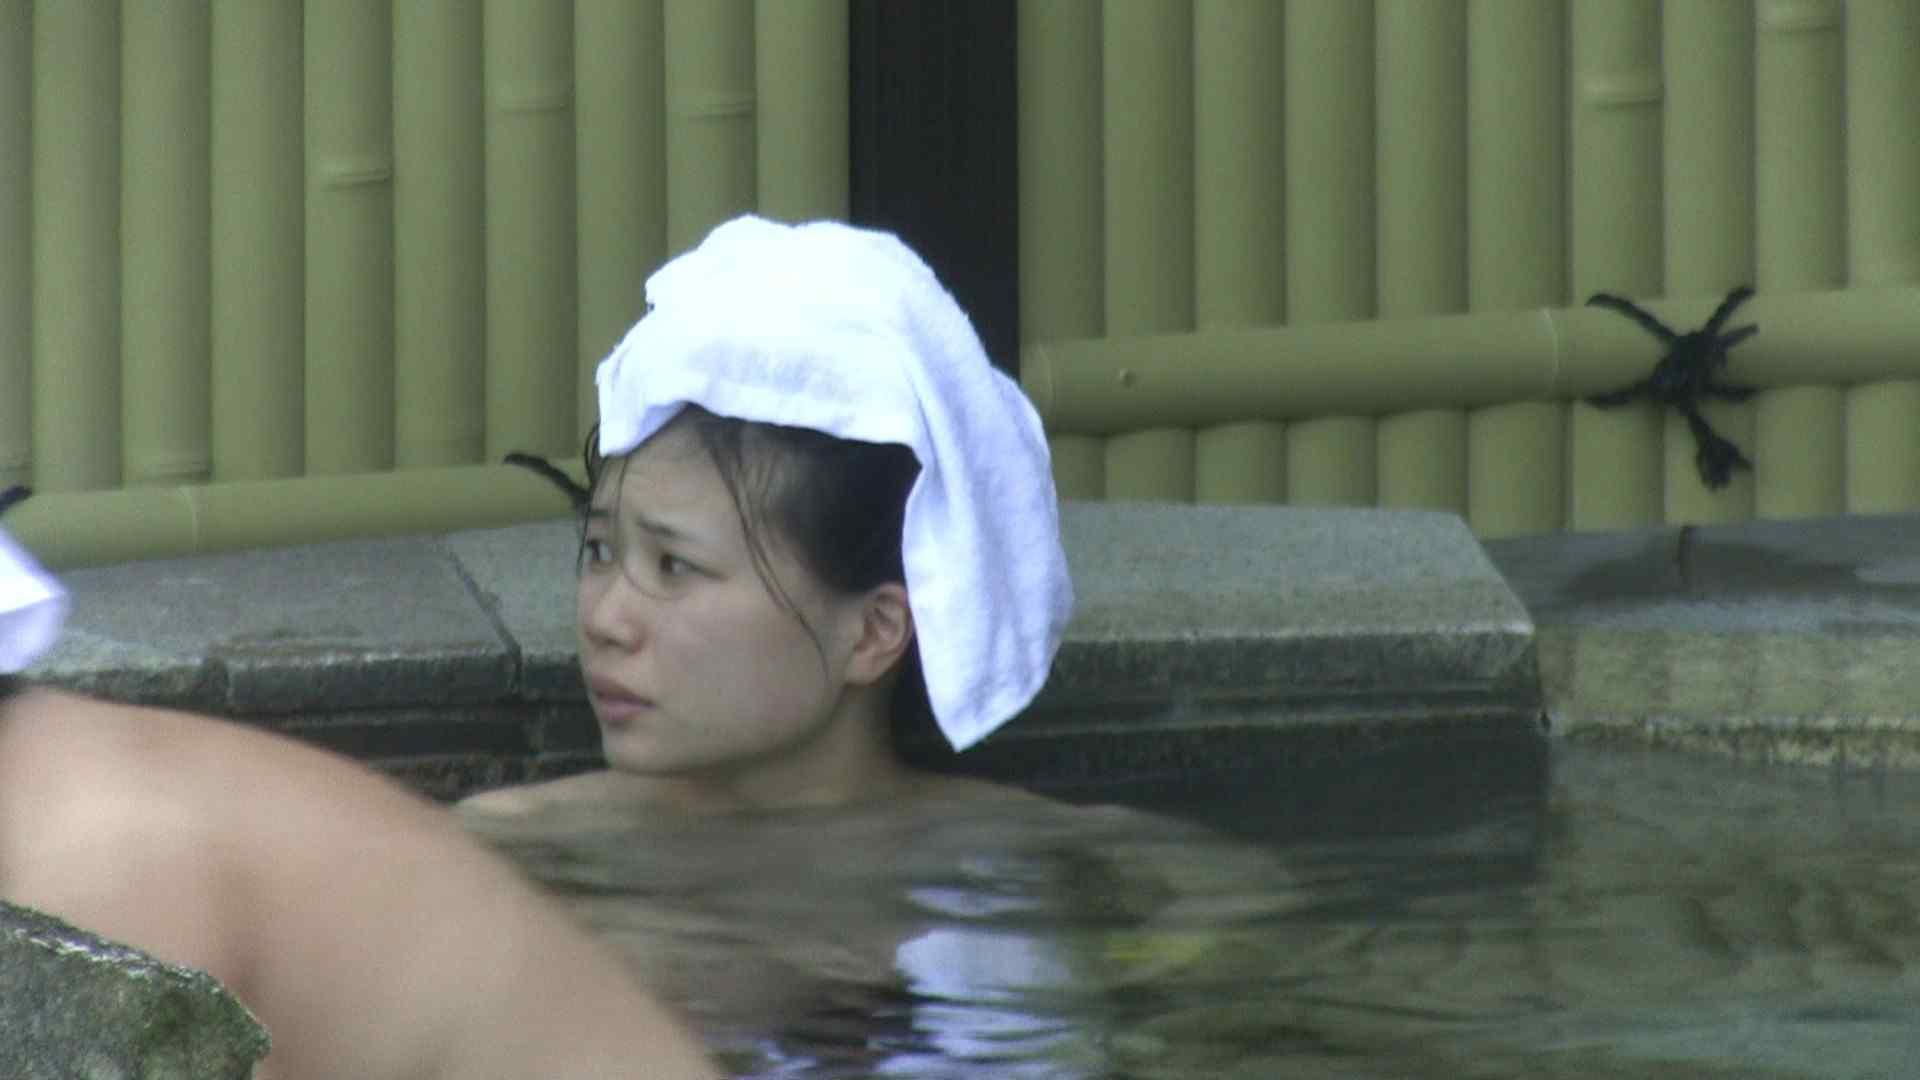 Aquaな露天風呂Vol.183 エッチな盗撮 ワレメ無修正動画無料 106pic 68